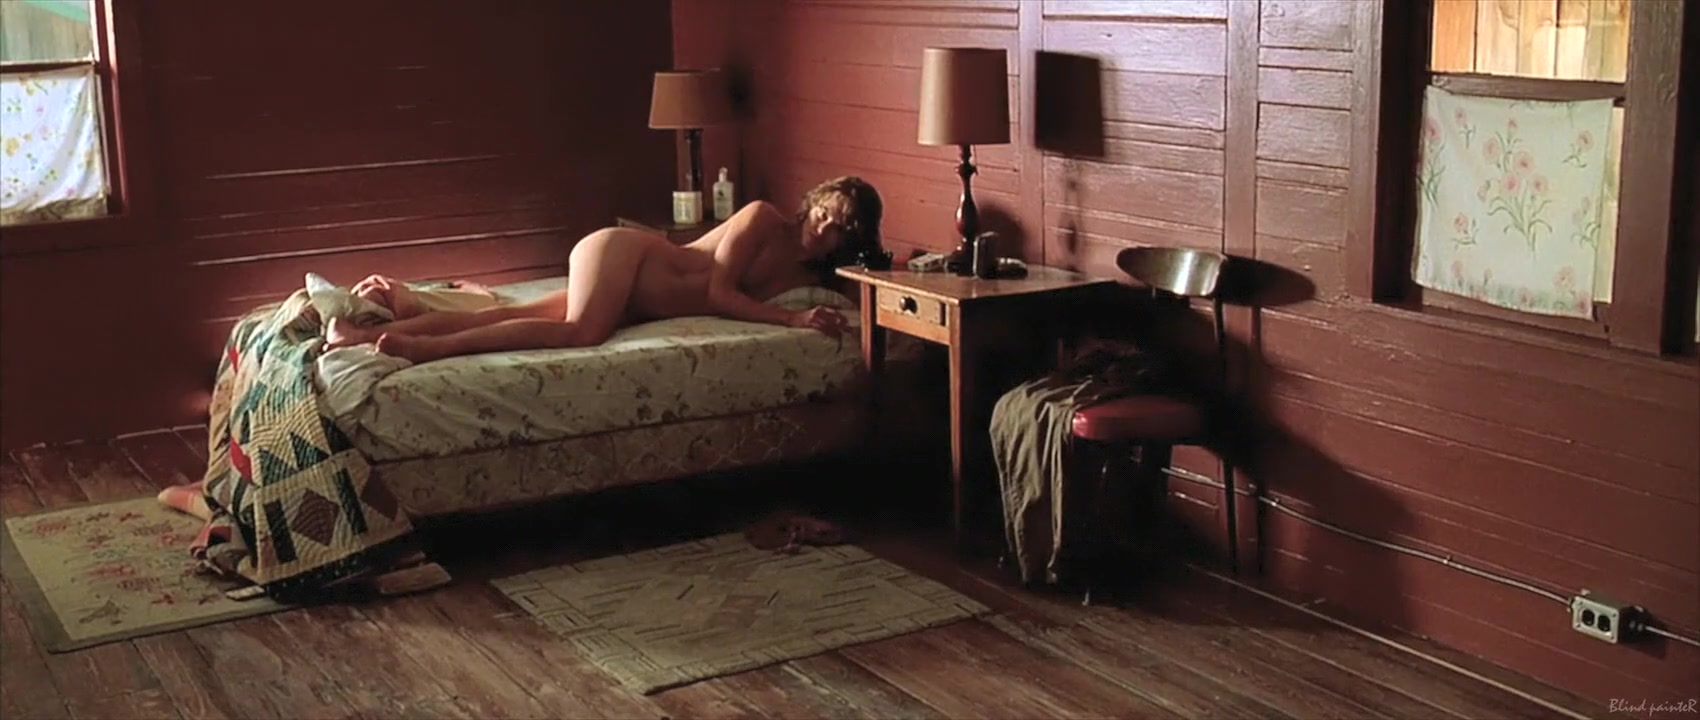 The Human Spot 2003 Nicole Kidman